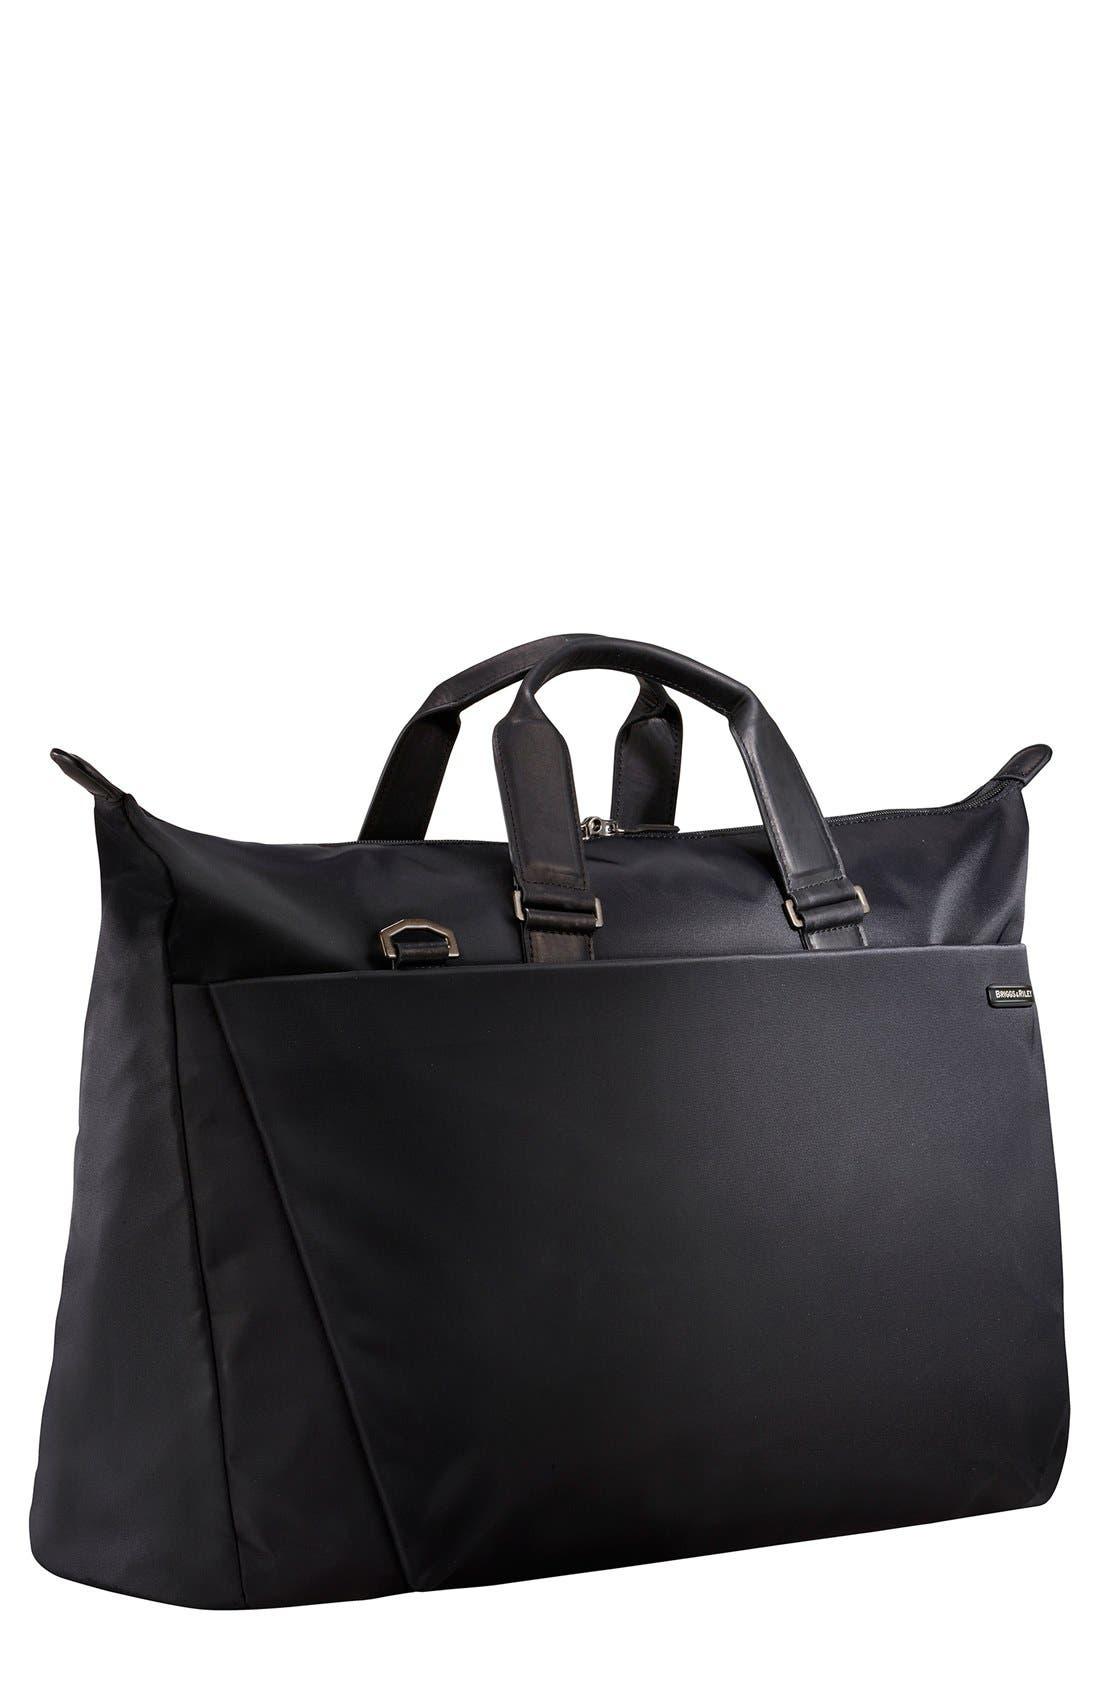 Sympatico 22-Inch Duffel Bag,                             Main thumbnail 1, color,                             Black